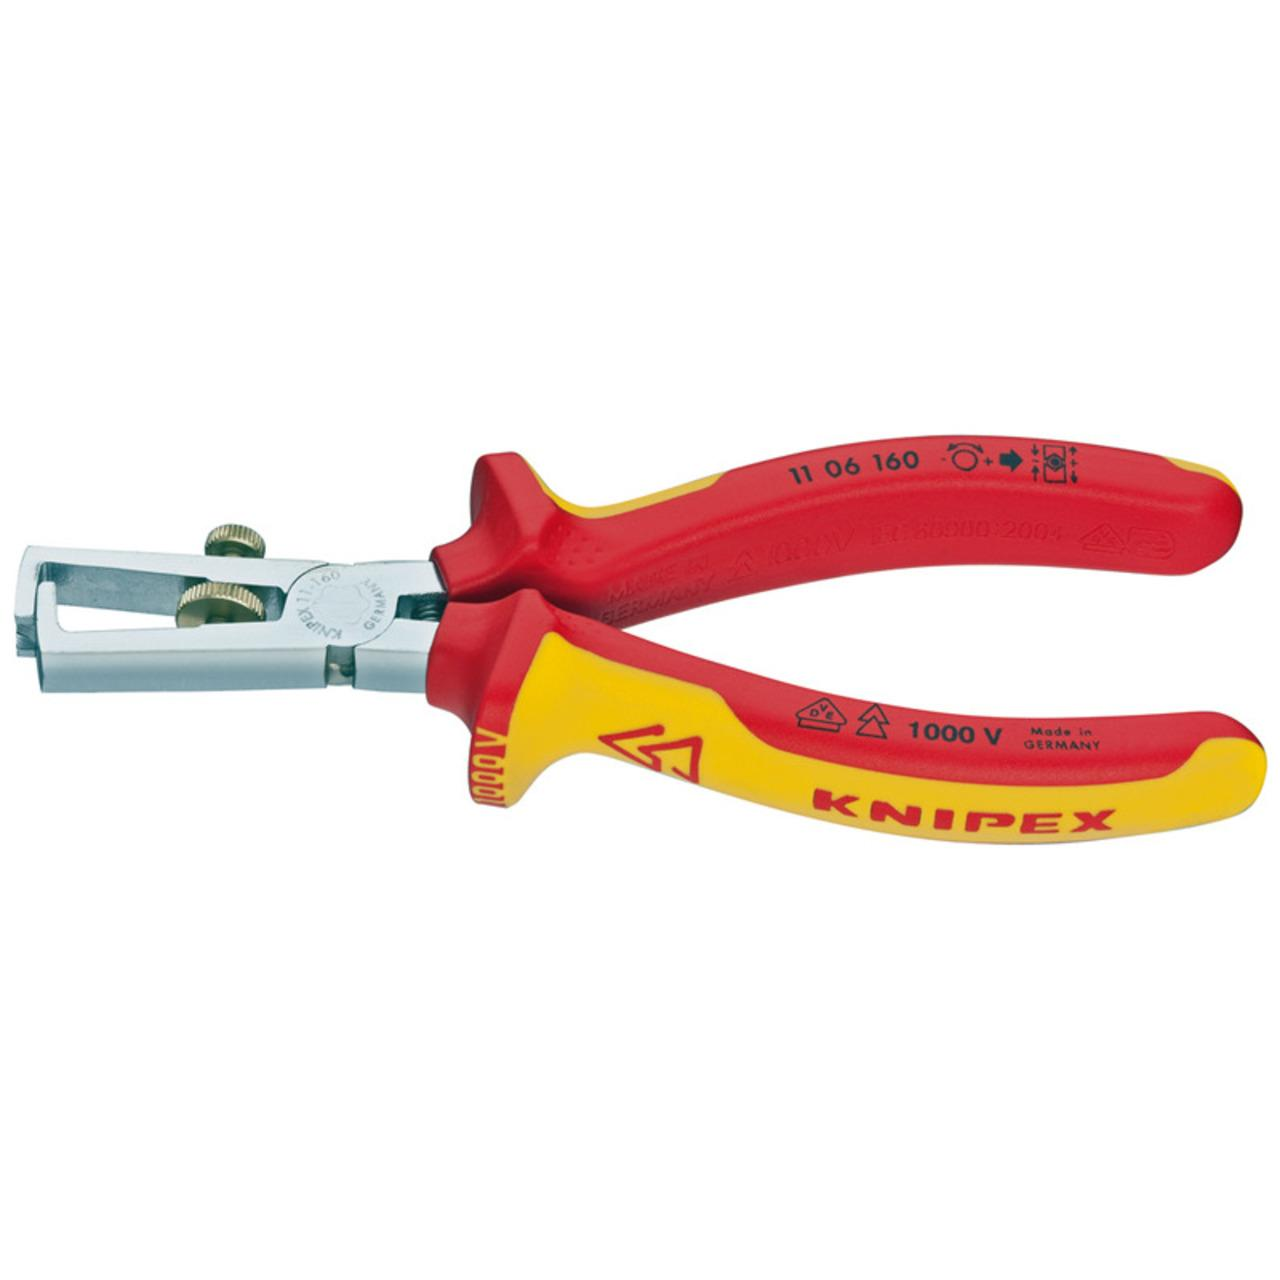 Knipex VDE-Abisolierzange 160 mm